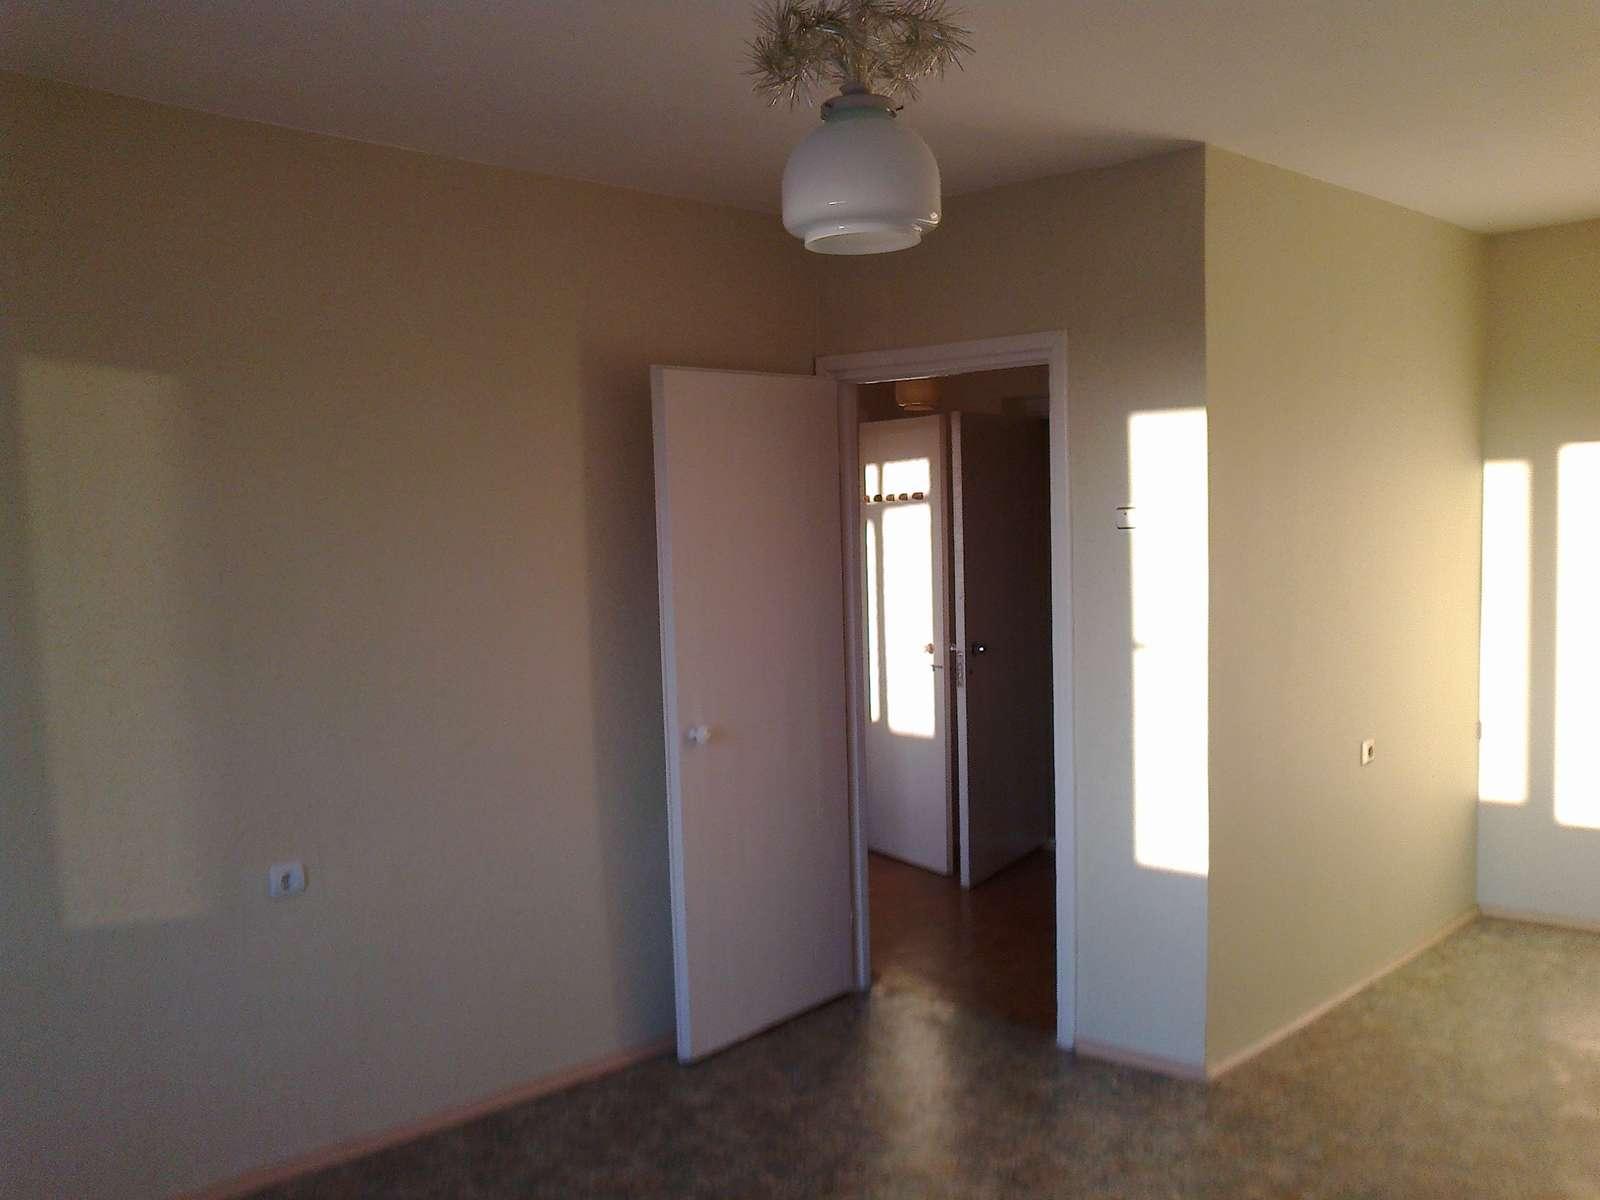 Аренда 1-комнатной квартиры, г. Тольятти, Юбилейная улица  дом 85